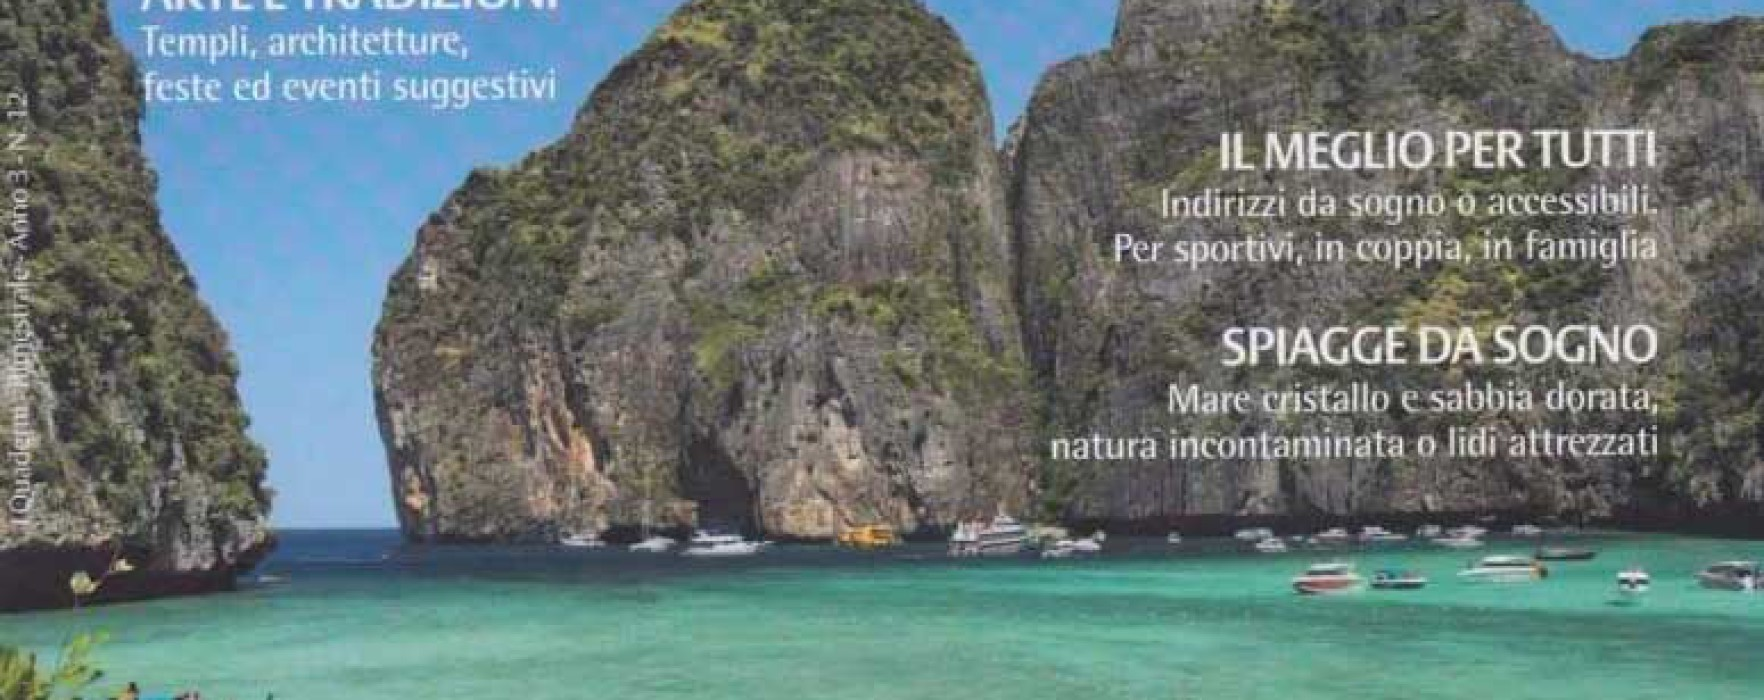 "The 7 Muay Thai Gym & Beach Resort on the Italian Magazine: ""Diari di Viaggio: Thailandia"""